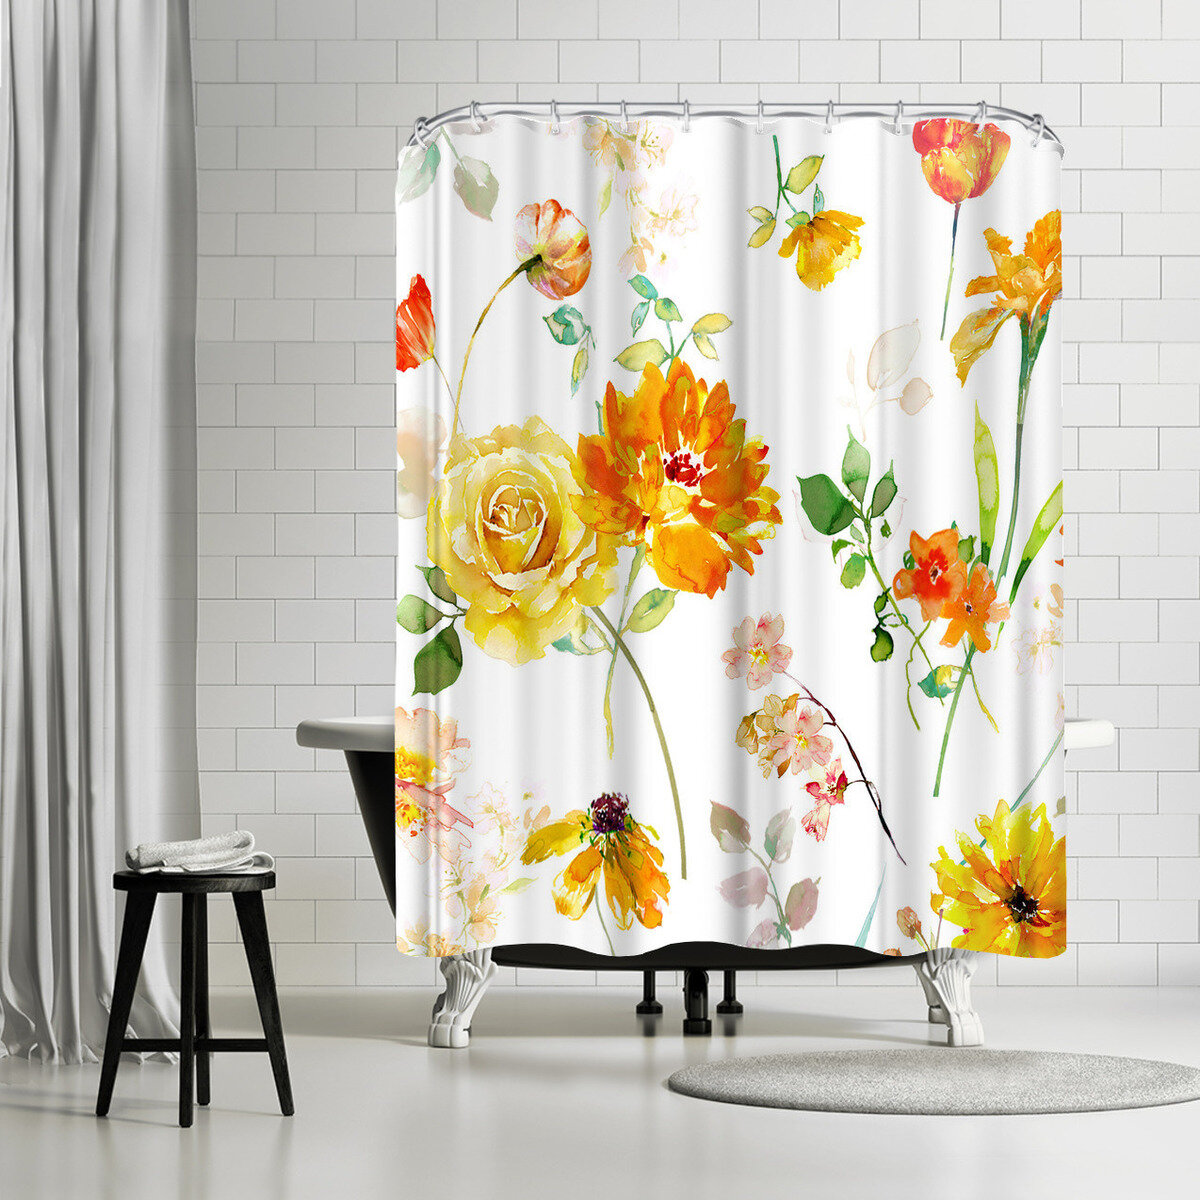 East Urban Home Harrison Ripley Peony Shower Curtain